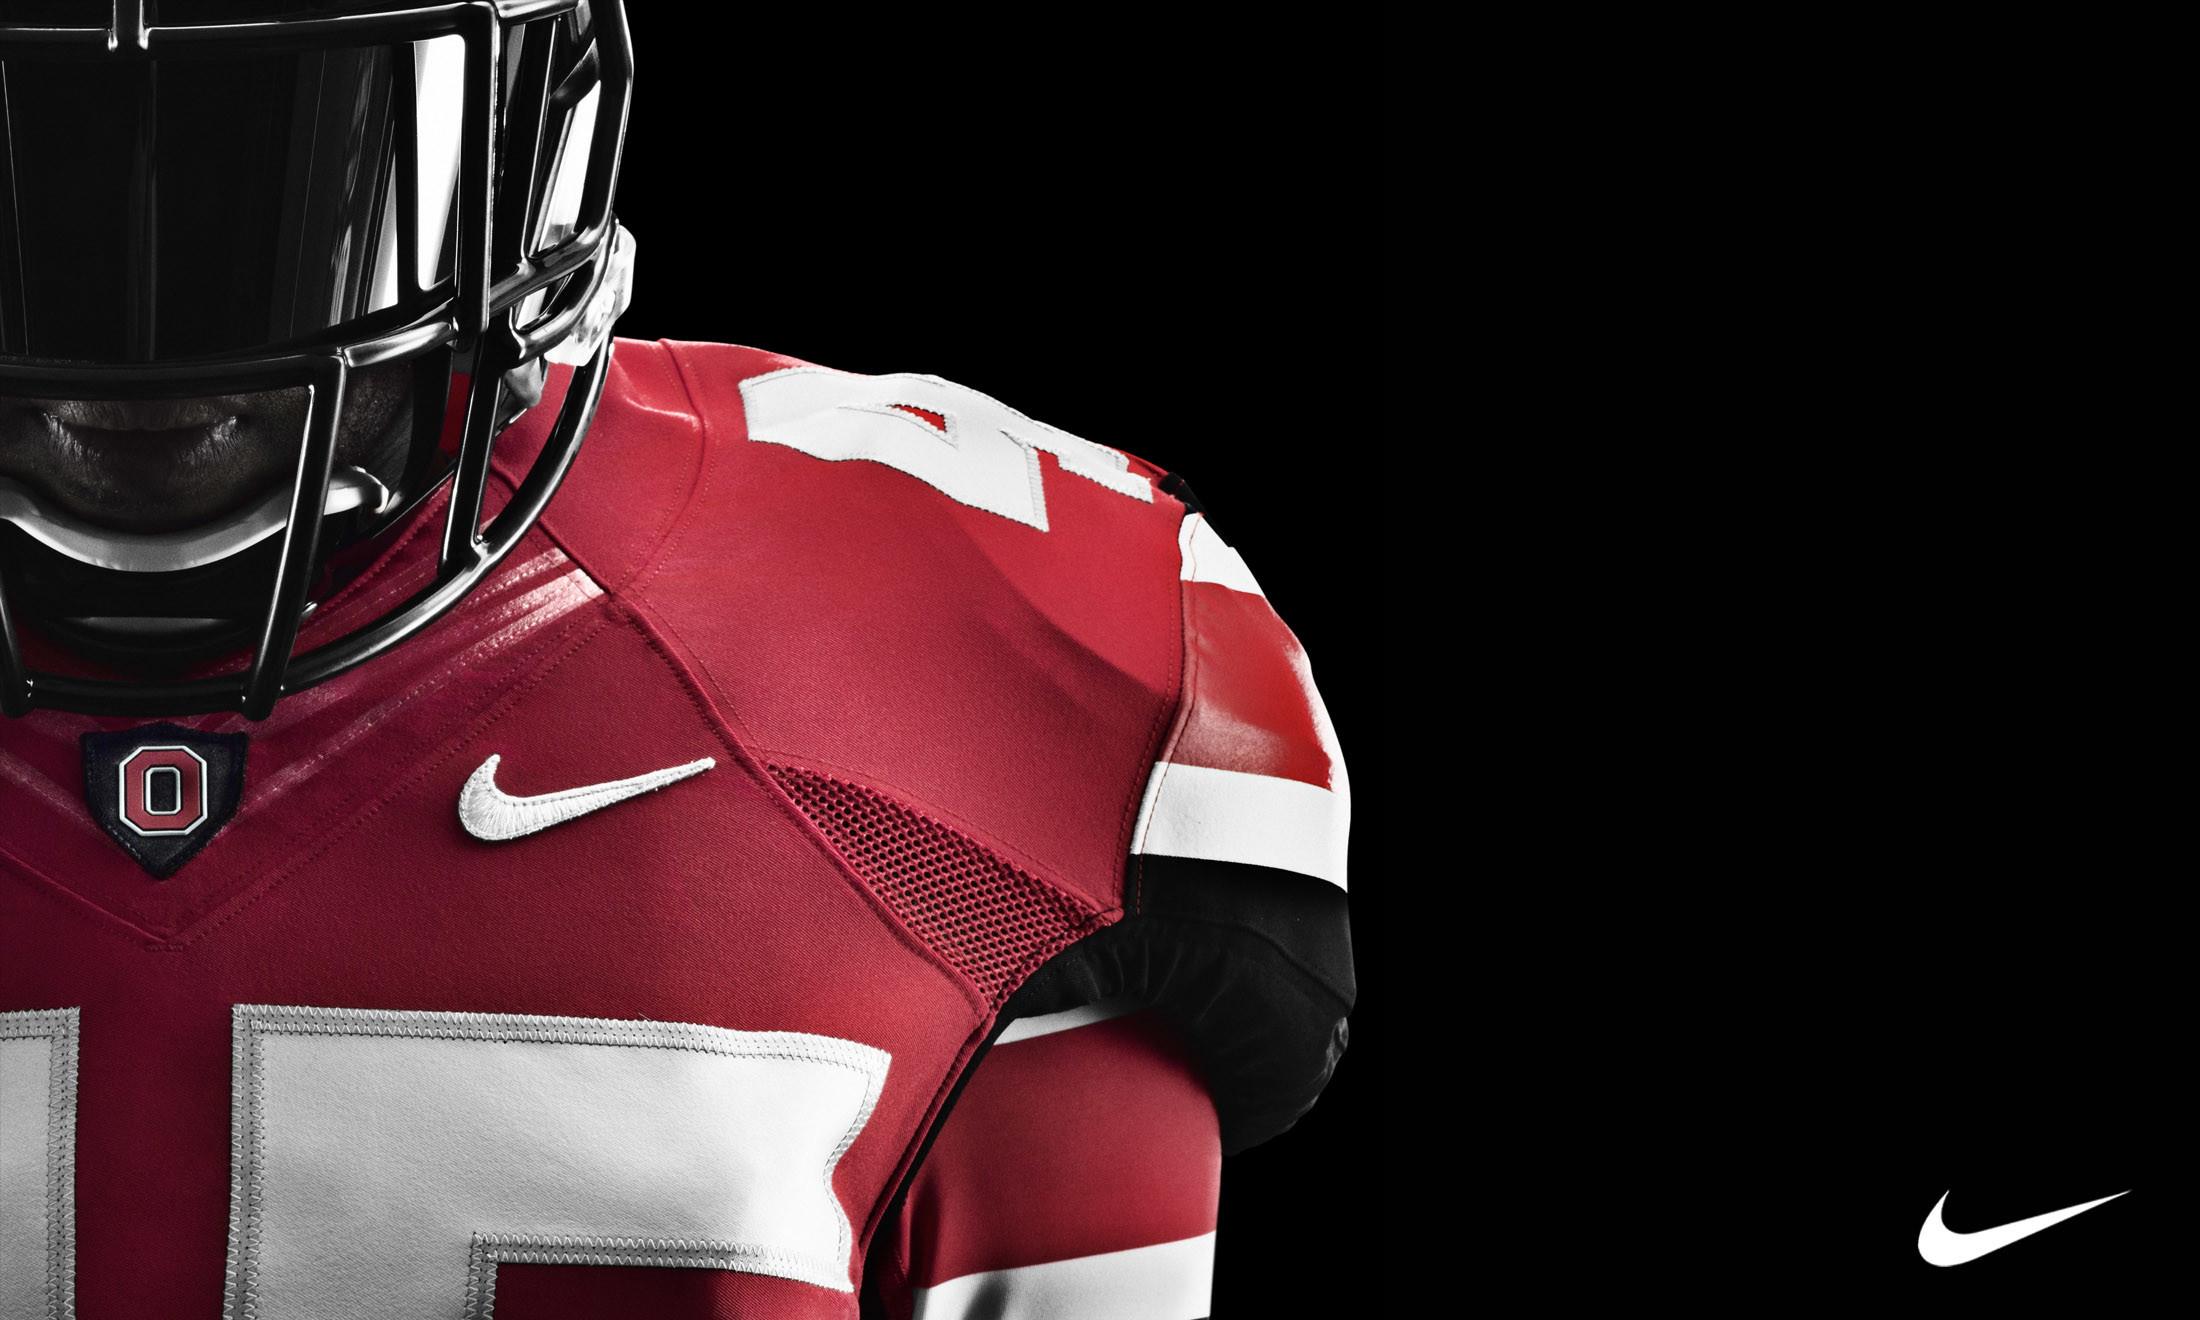 Nike ProCombat College Football Uniforms   HD Wallpapers   Pinterest   Nike  pro combat, Hd wallpaper and Wallpaper